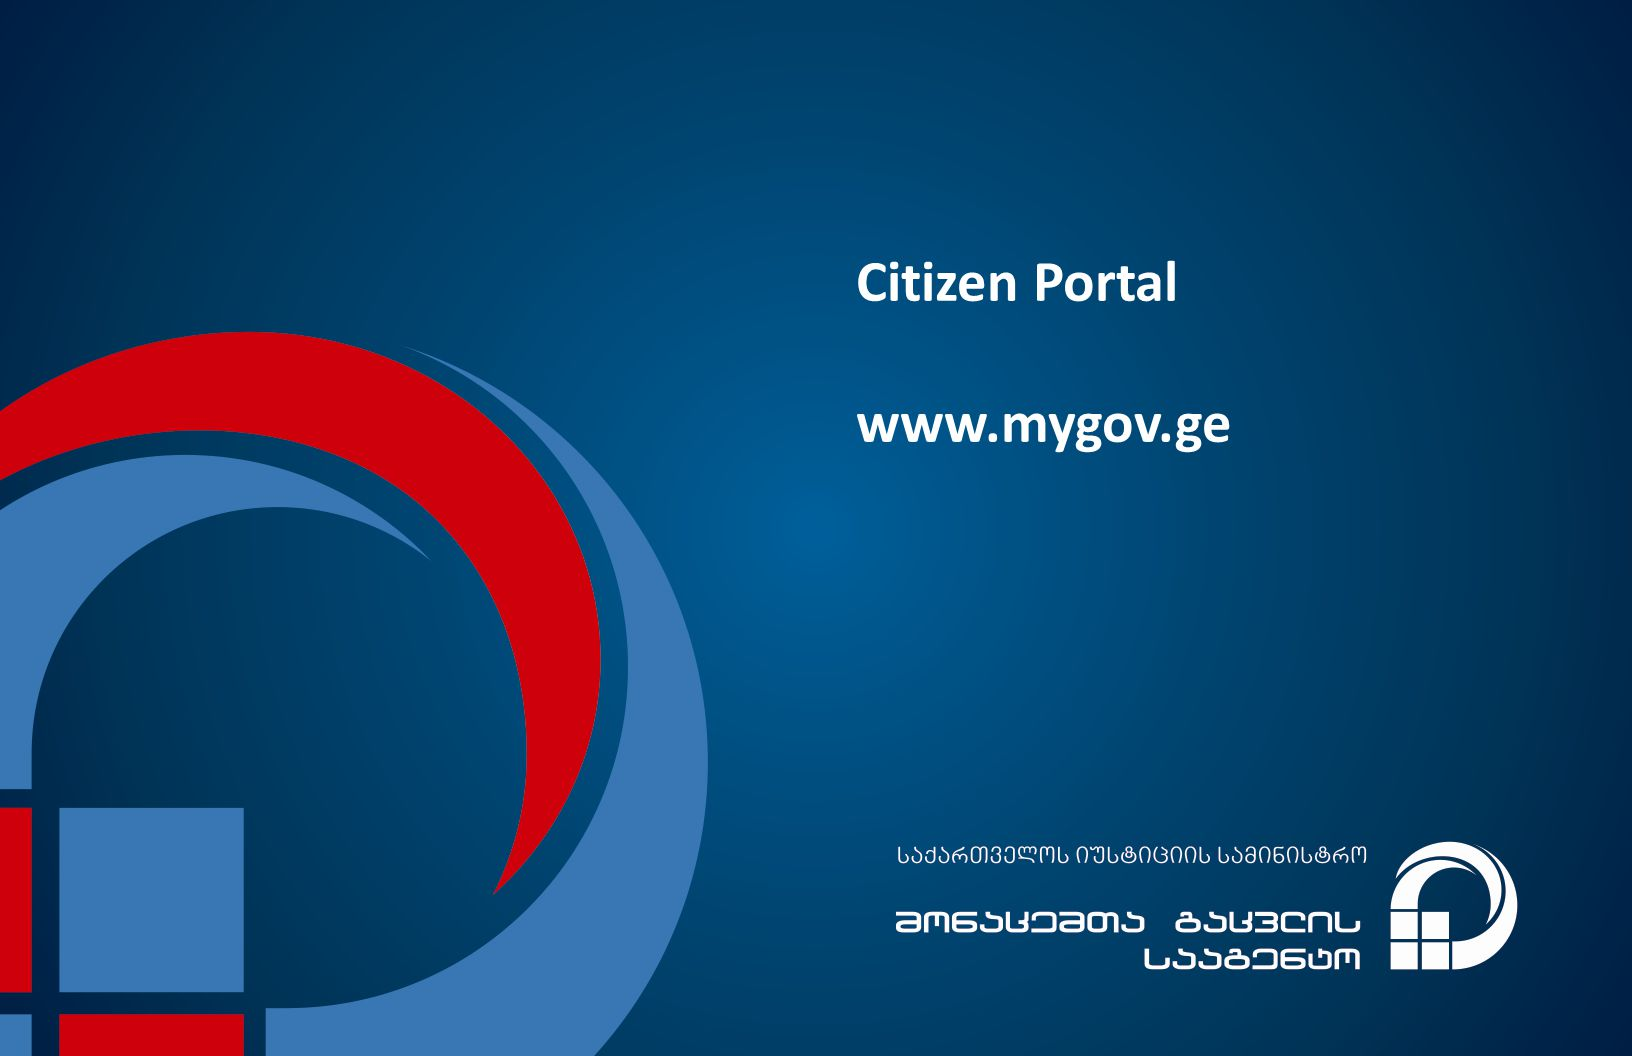 Citizen Portal www.mygov.ge